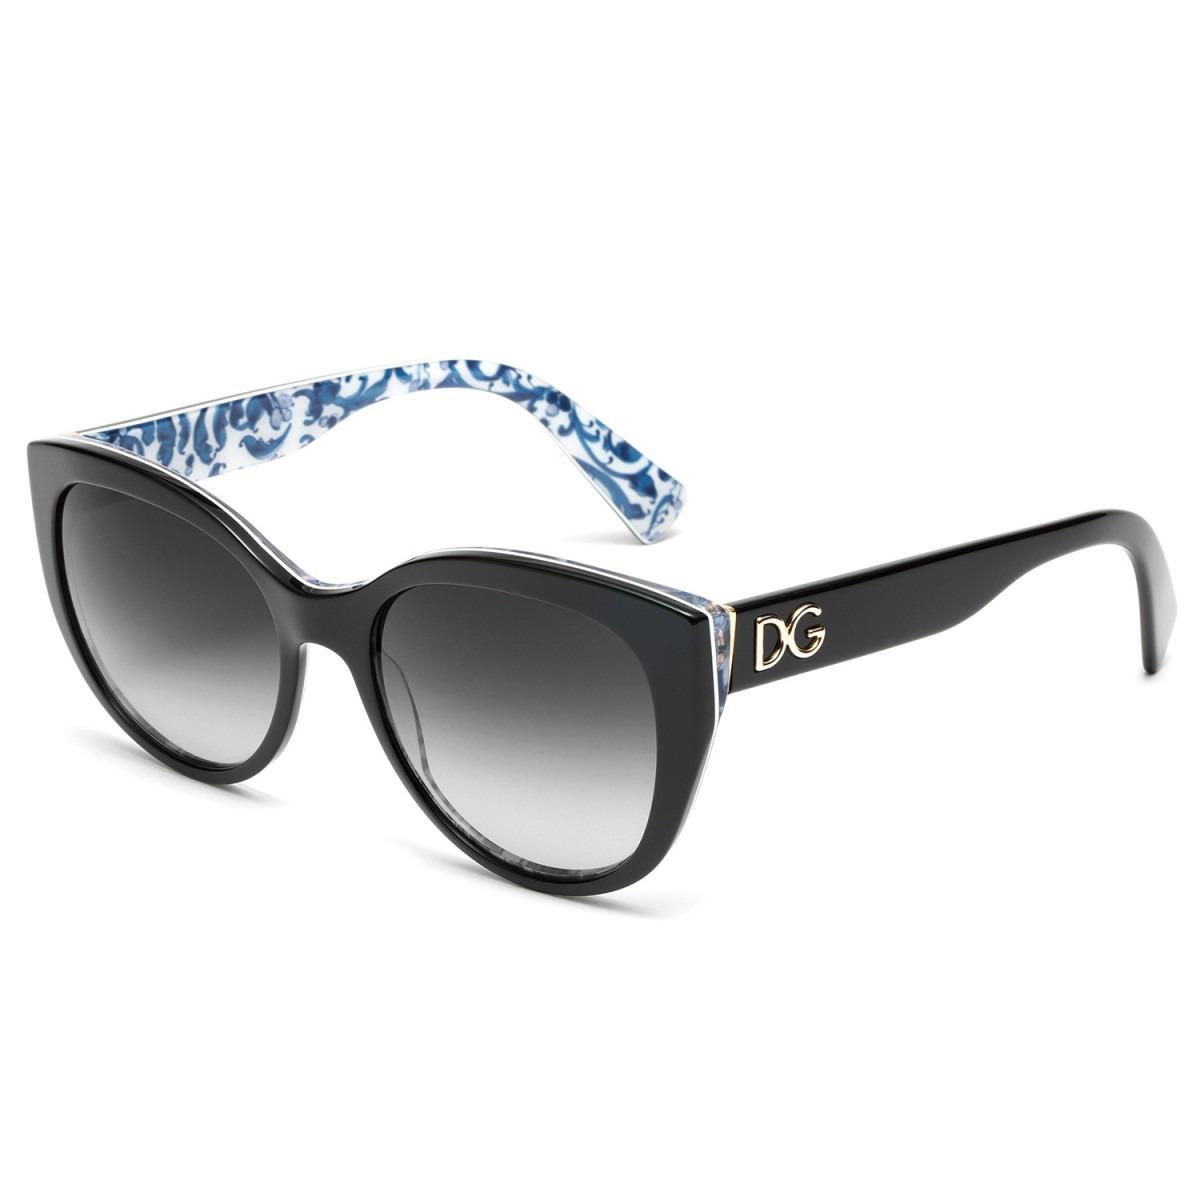 2bfec9cbba78d Óculos De Sol Dolce Gabbana Dg4217 2994 8g - R  728,00 em Mercado Livre